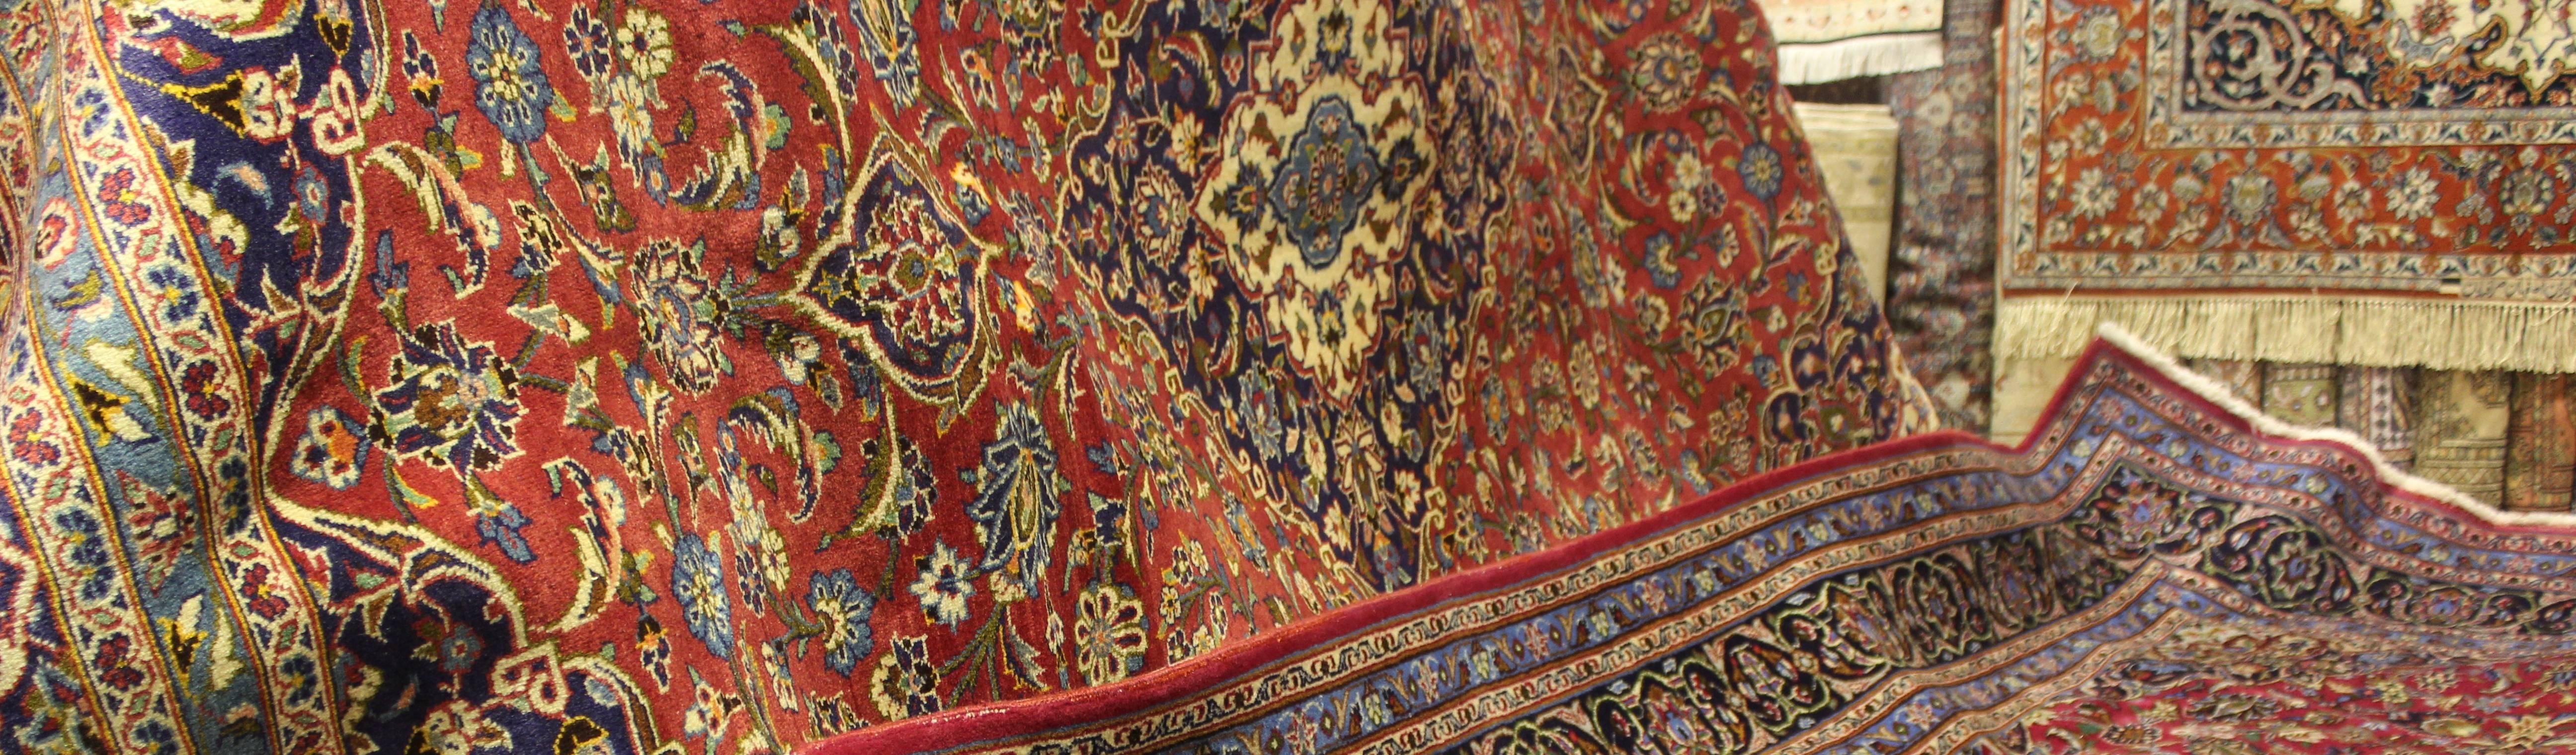 Capital Carpet Company